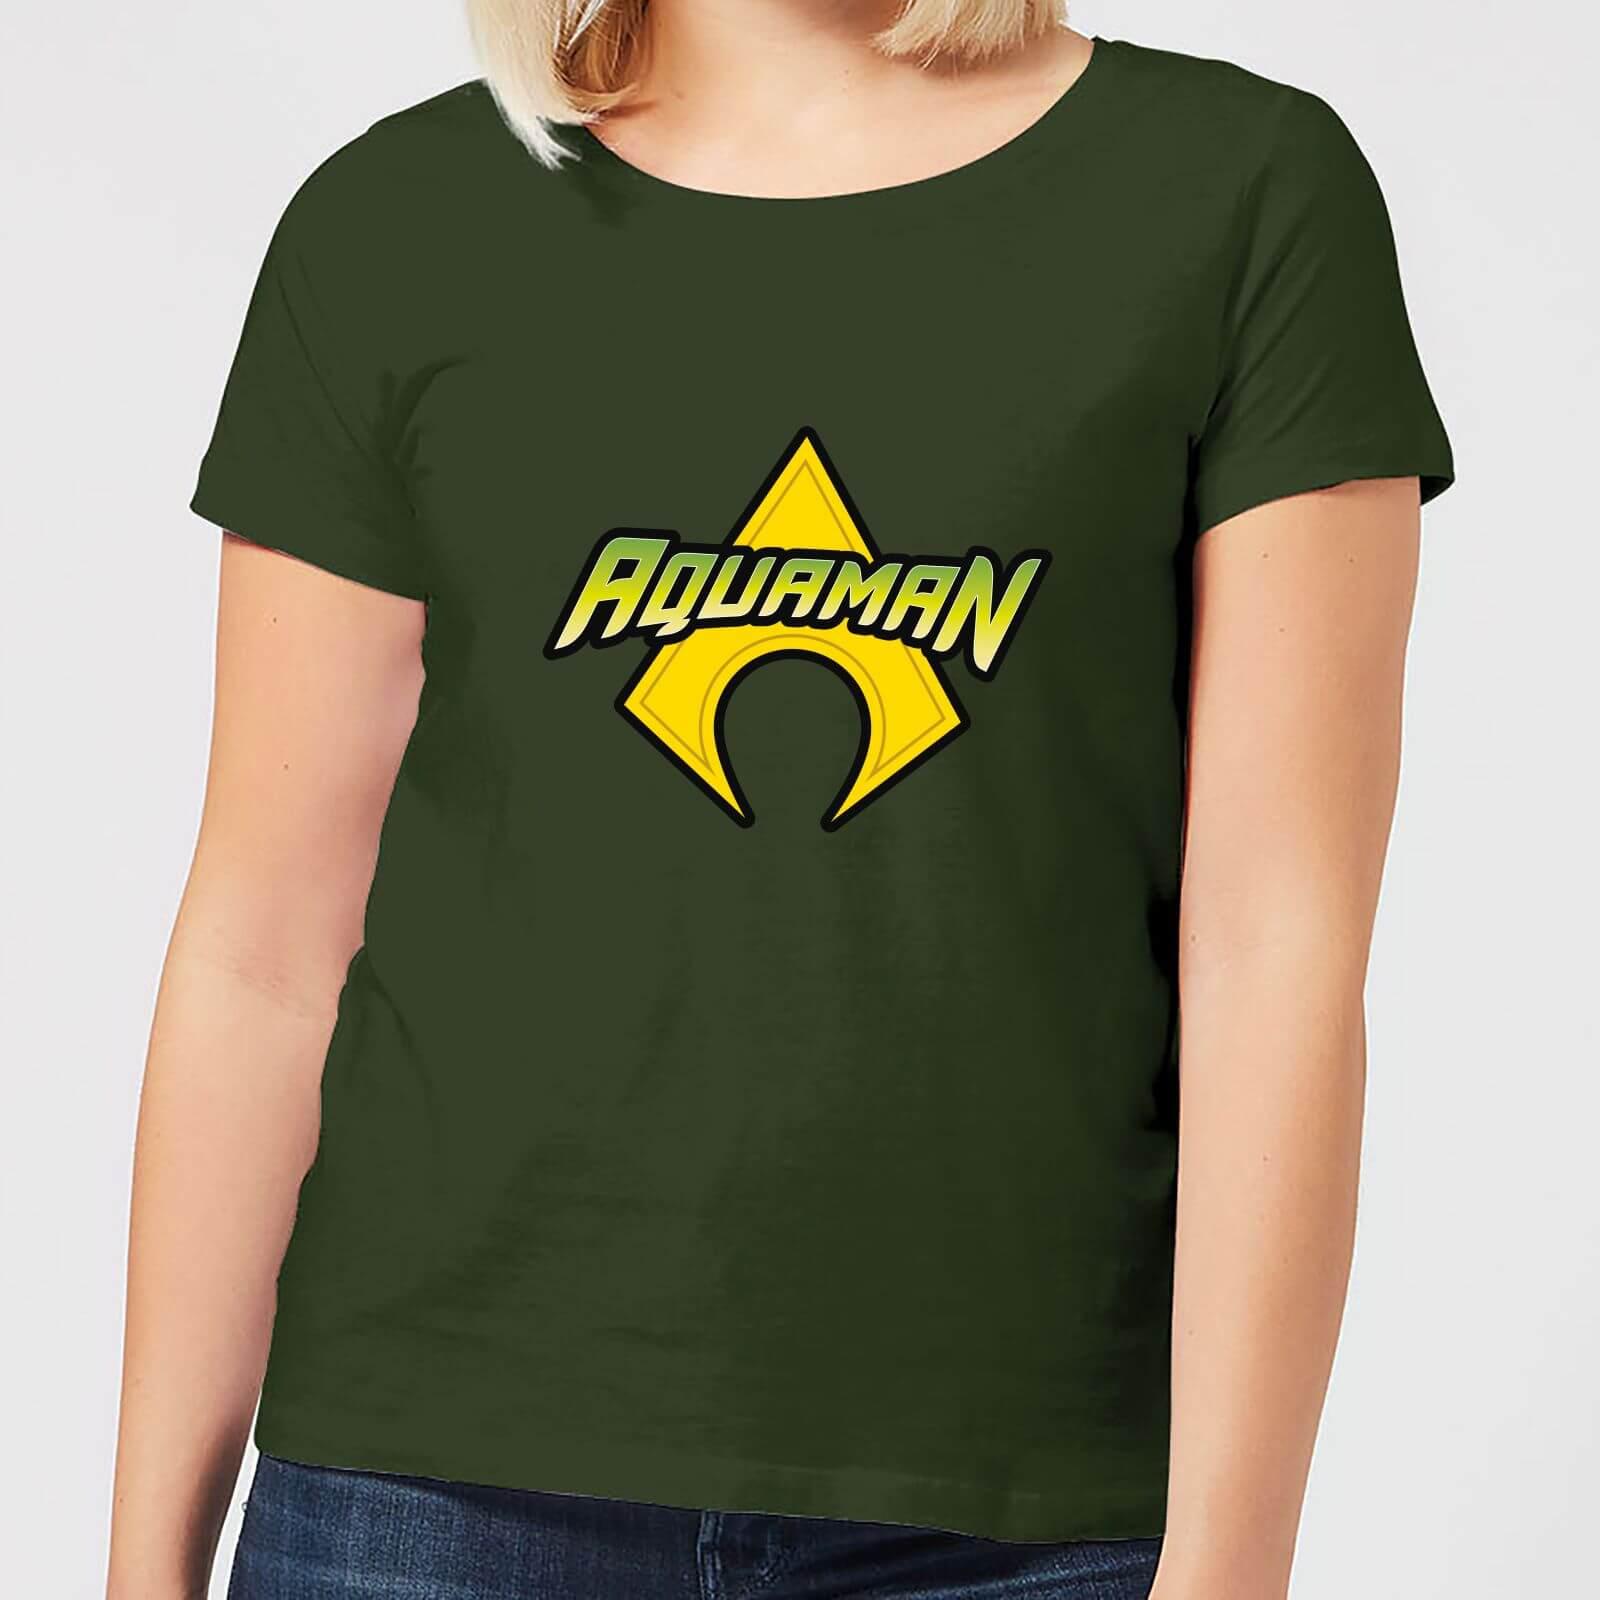 DC Comics Justice League Aquaman Logo Women's T-Shirt - Forest Green - XL - Forest Green